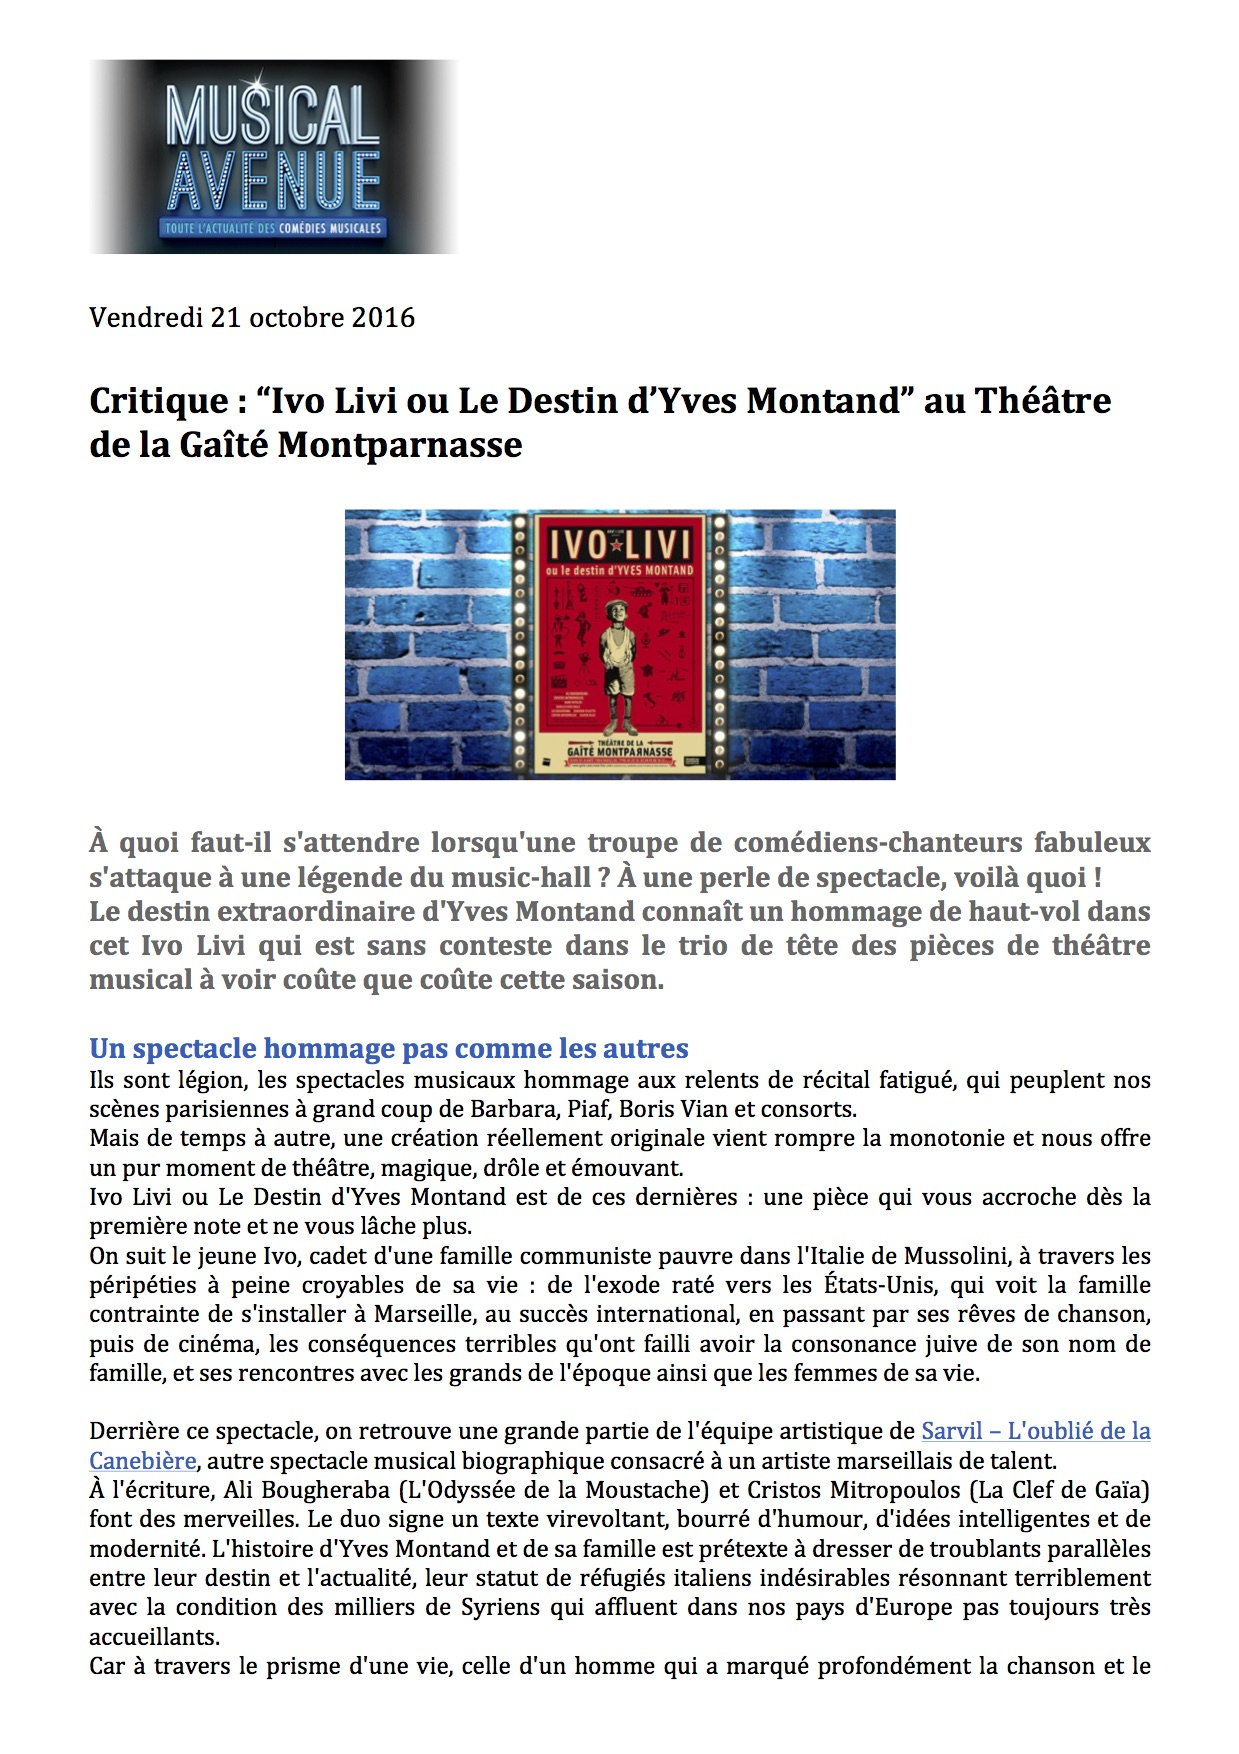 Musicalavenue.fr p1 - 21.10.16